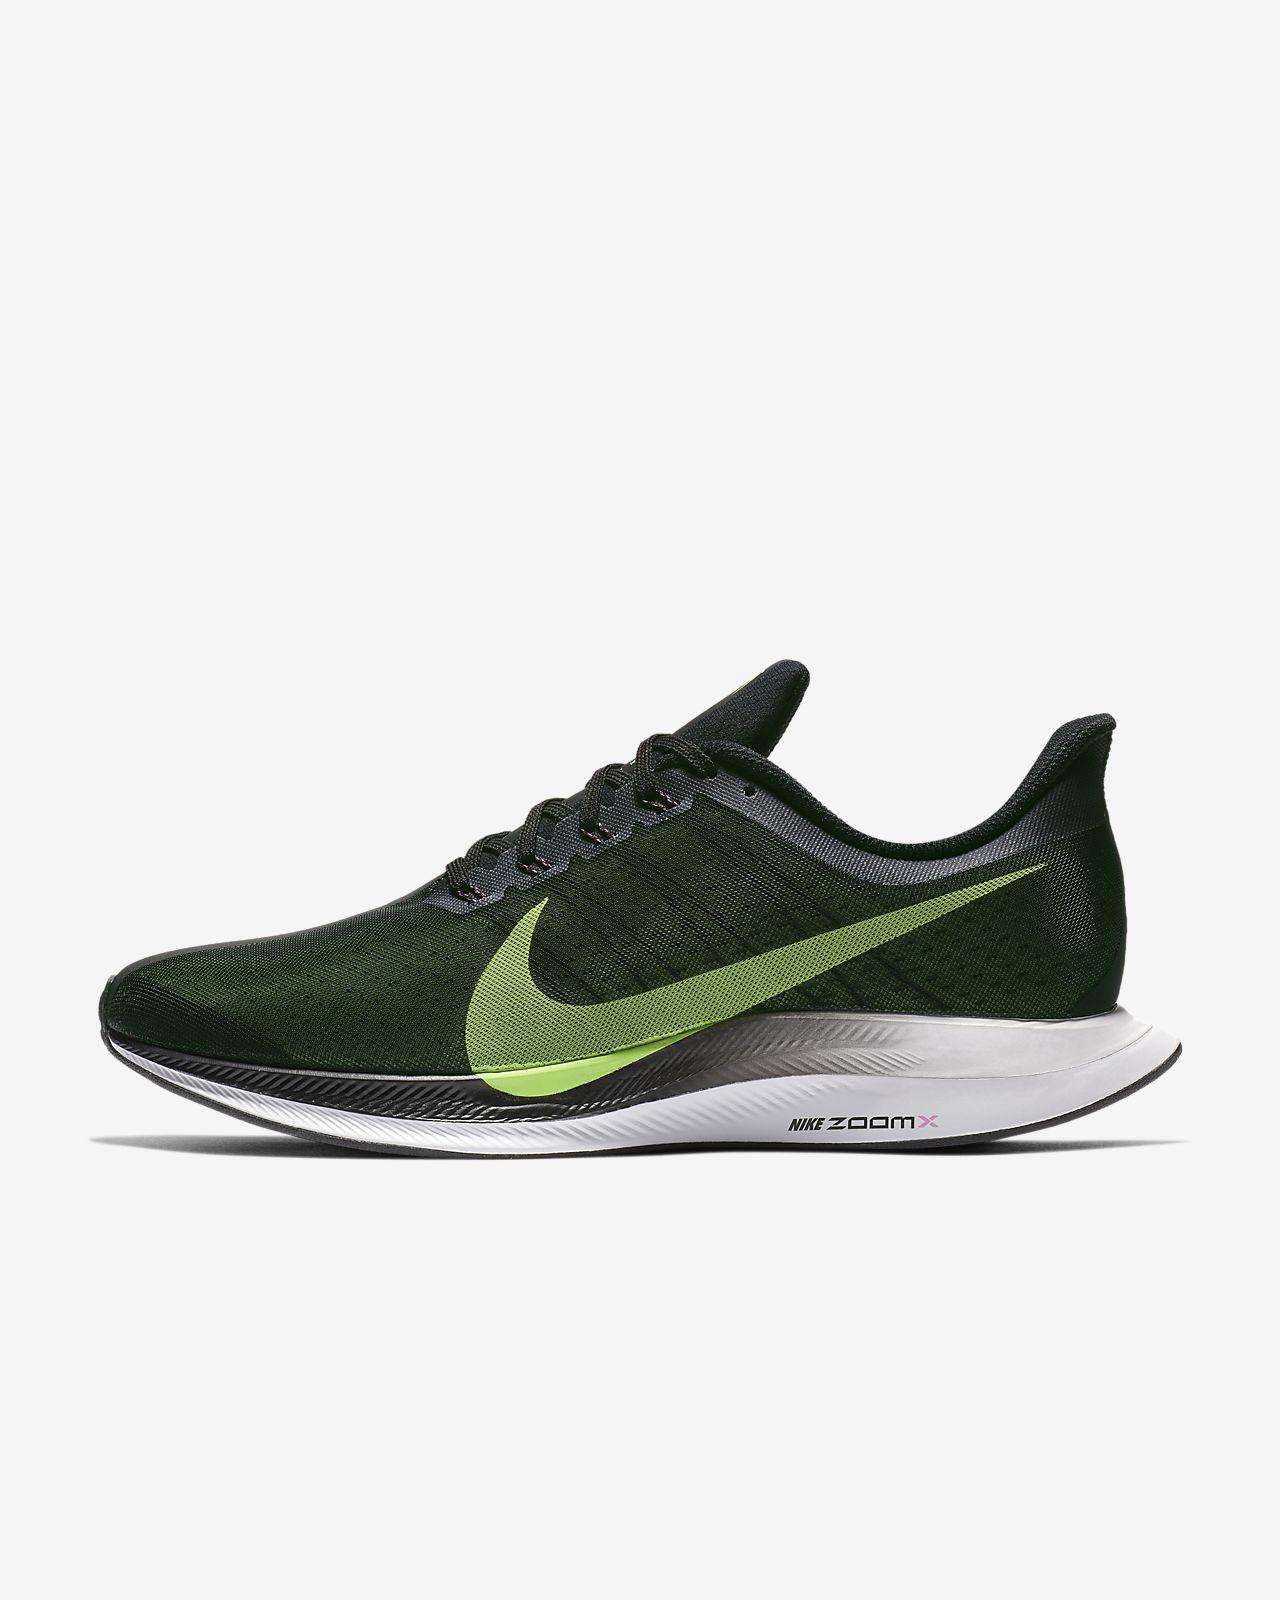 Chaussure de running Nike Zoom Pegasus Turbo pour Homme